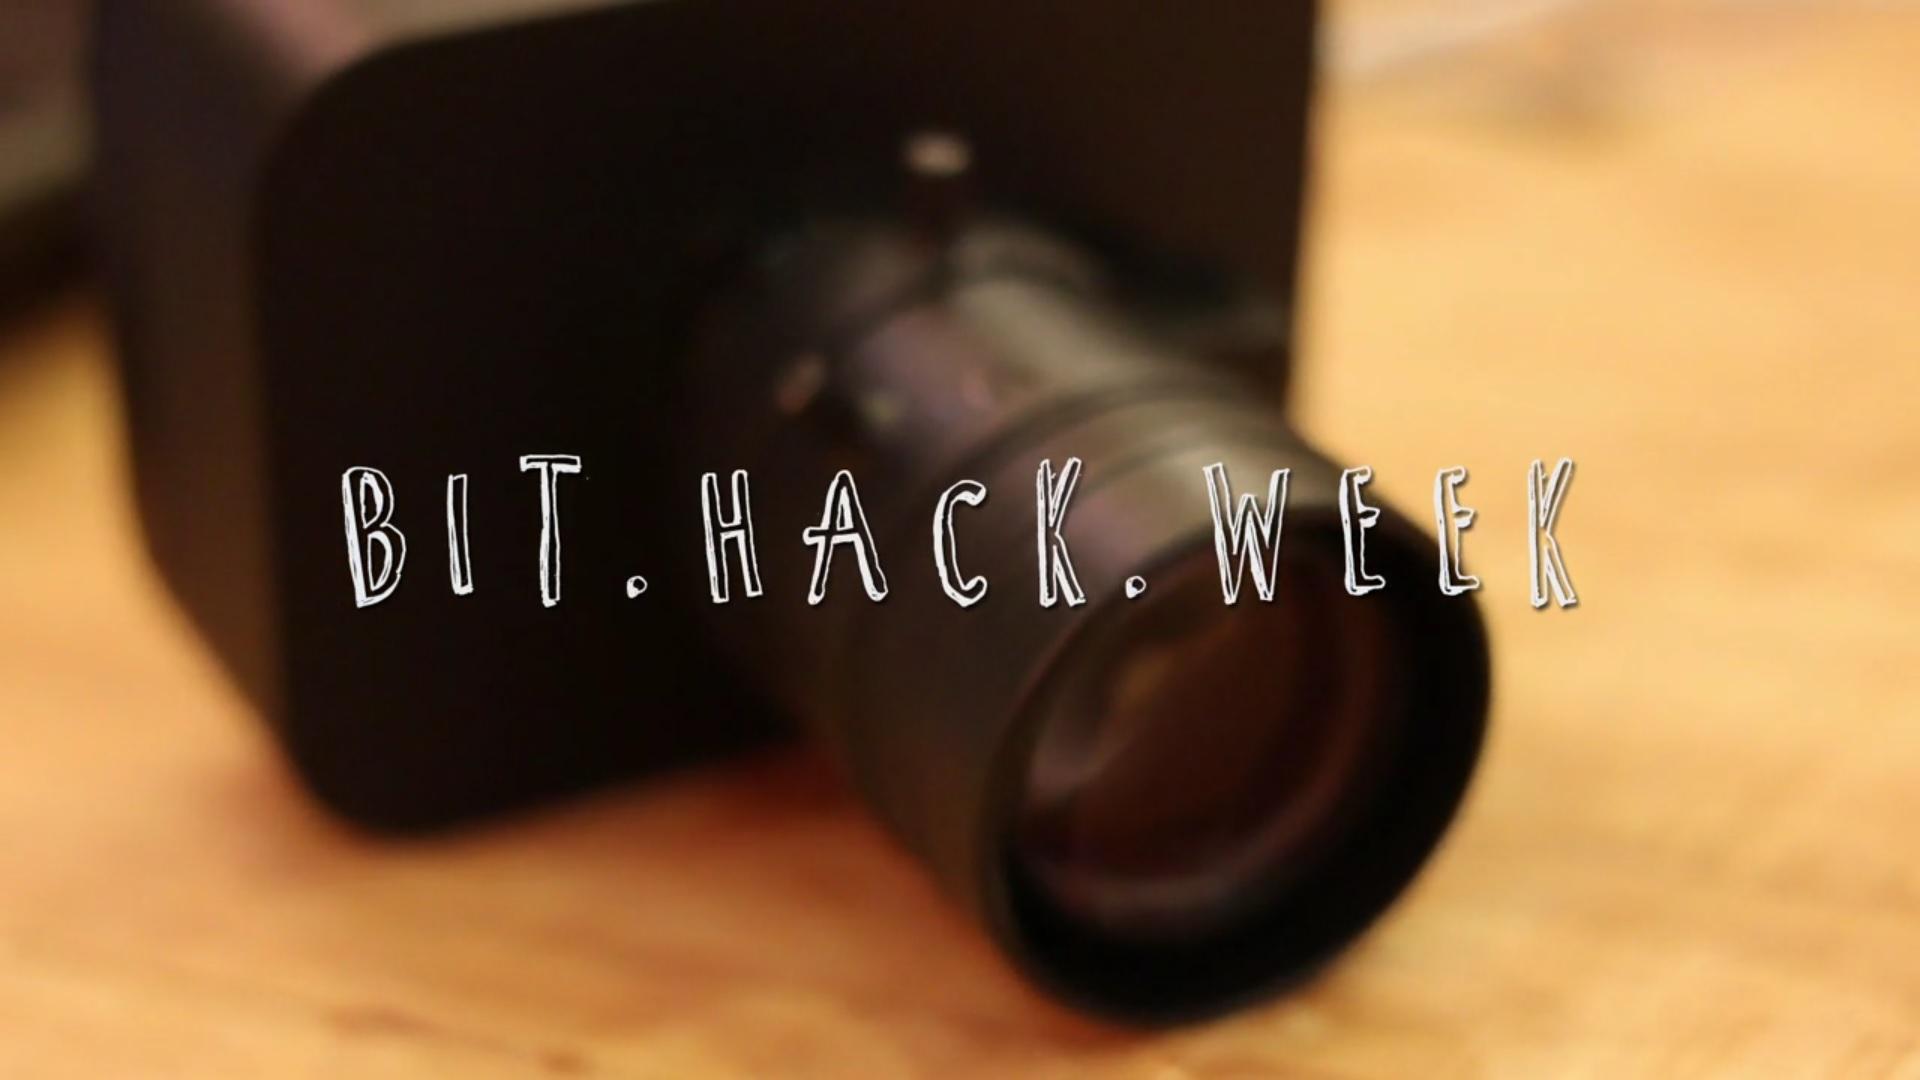 bit.hack.week.2014